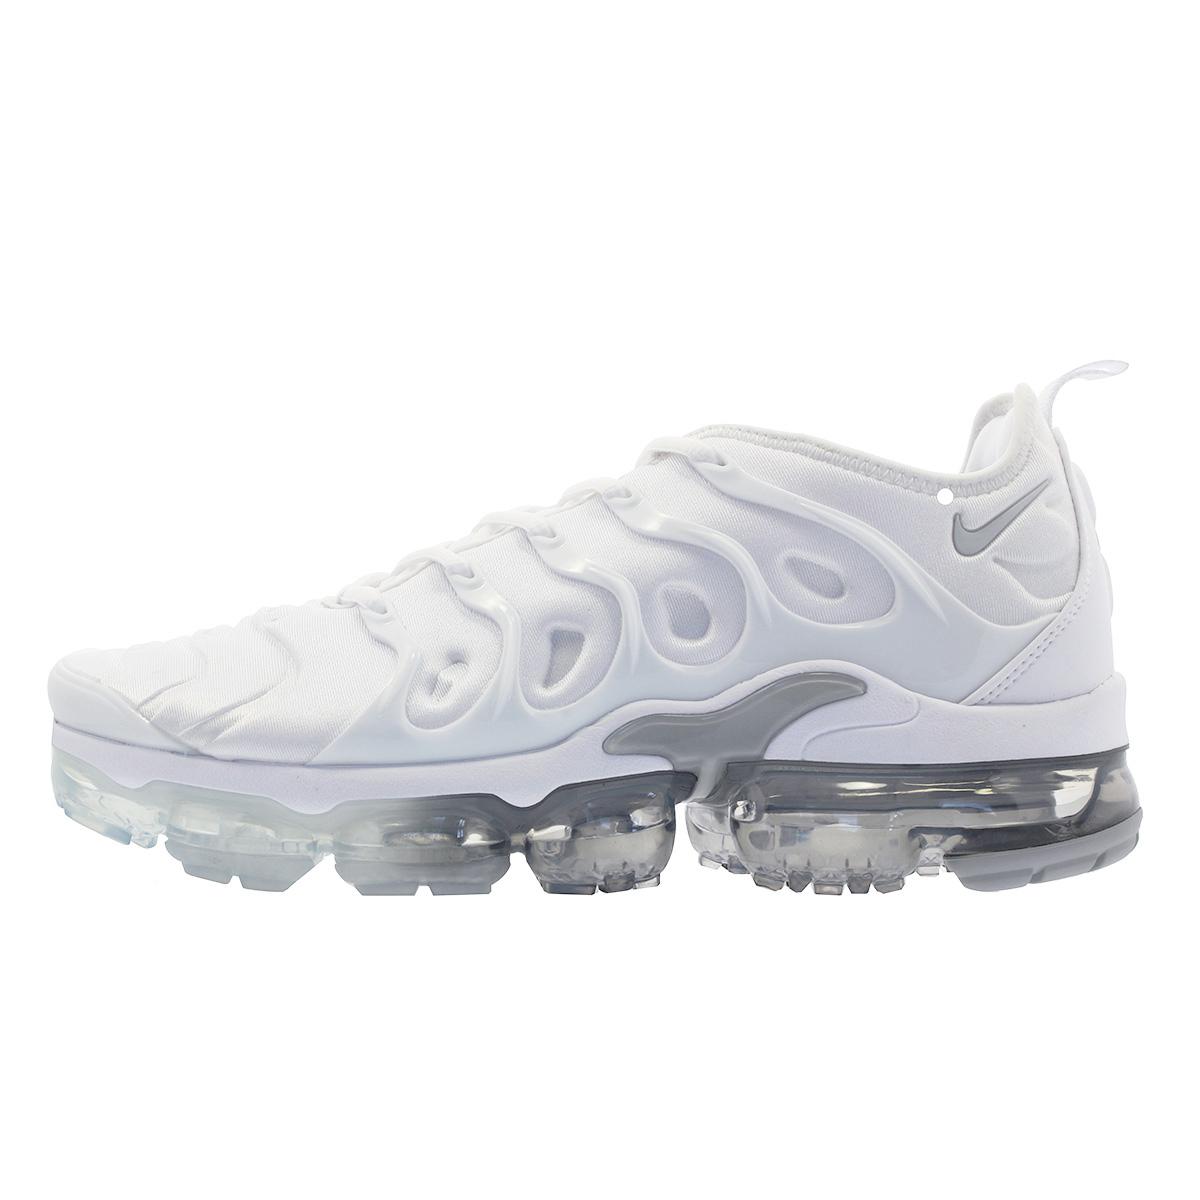 huge discount 41464 22deb NIKE AIR VAPORMAX PLUS Nike vapor max plus WHITE PURE PLATINUM WOLF GREY  924,453-102